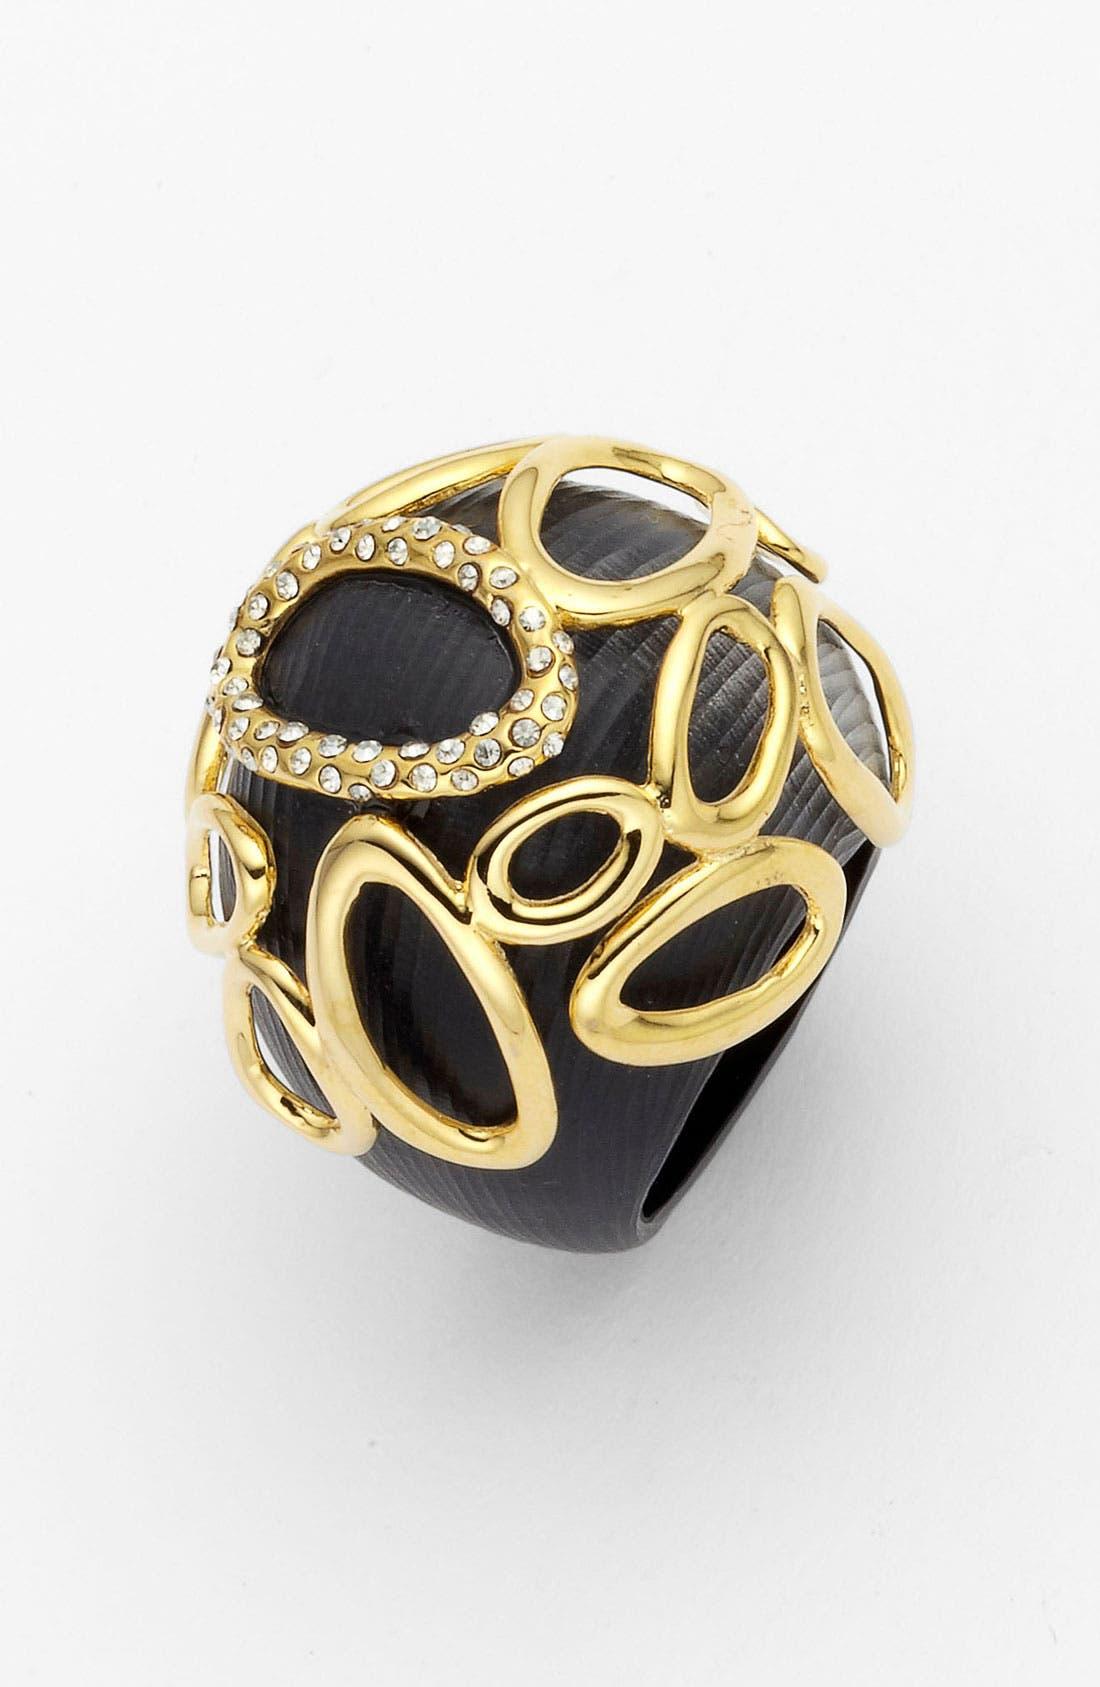 Main Image - Alexis Bittar 'Modular' Dome Ring